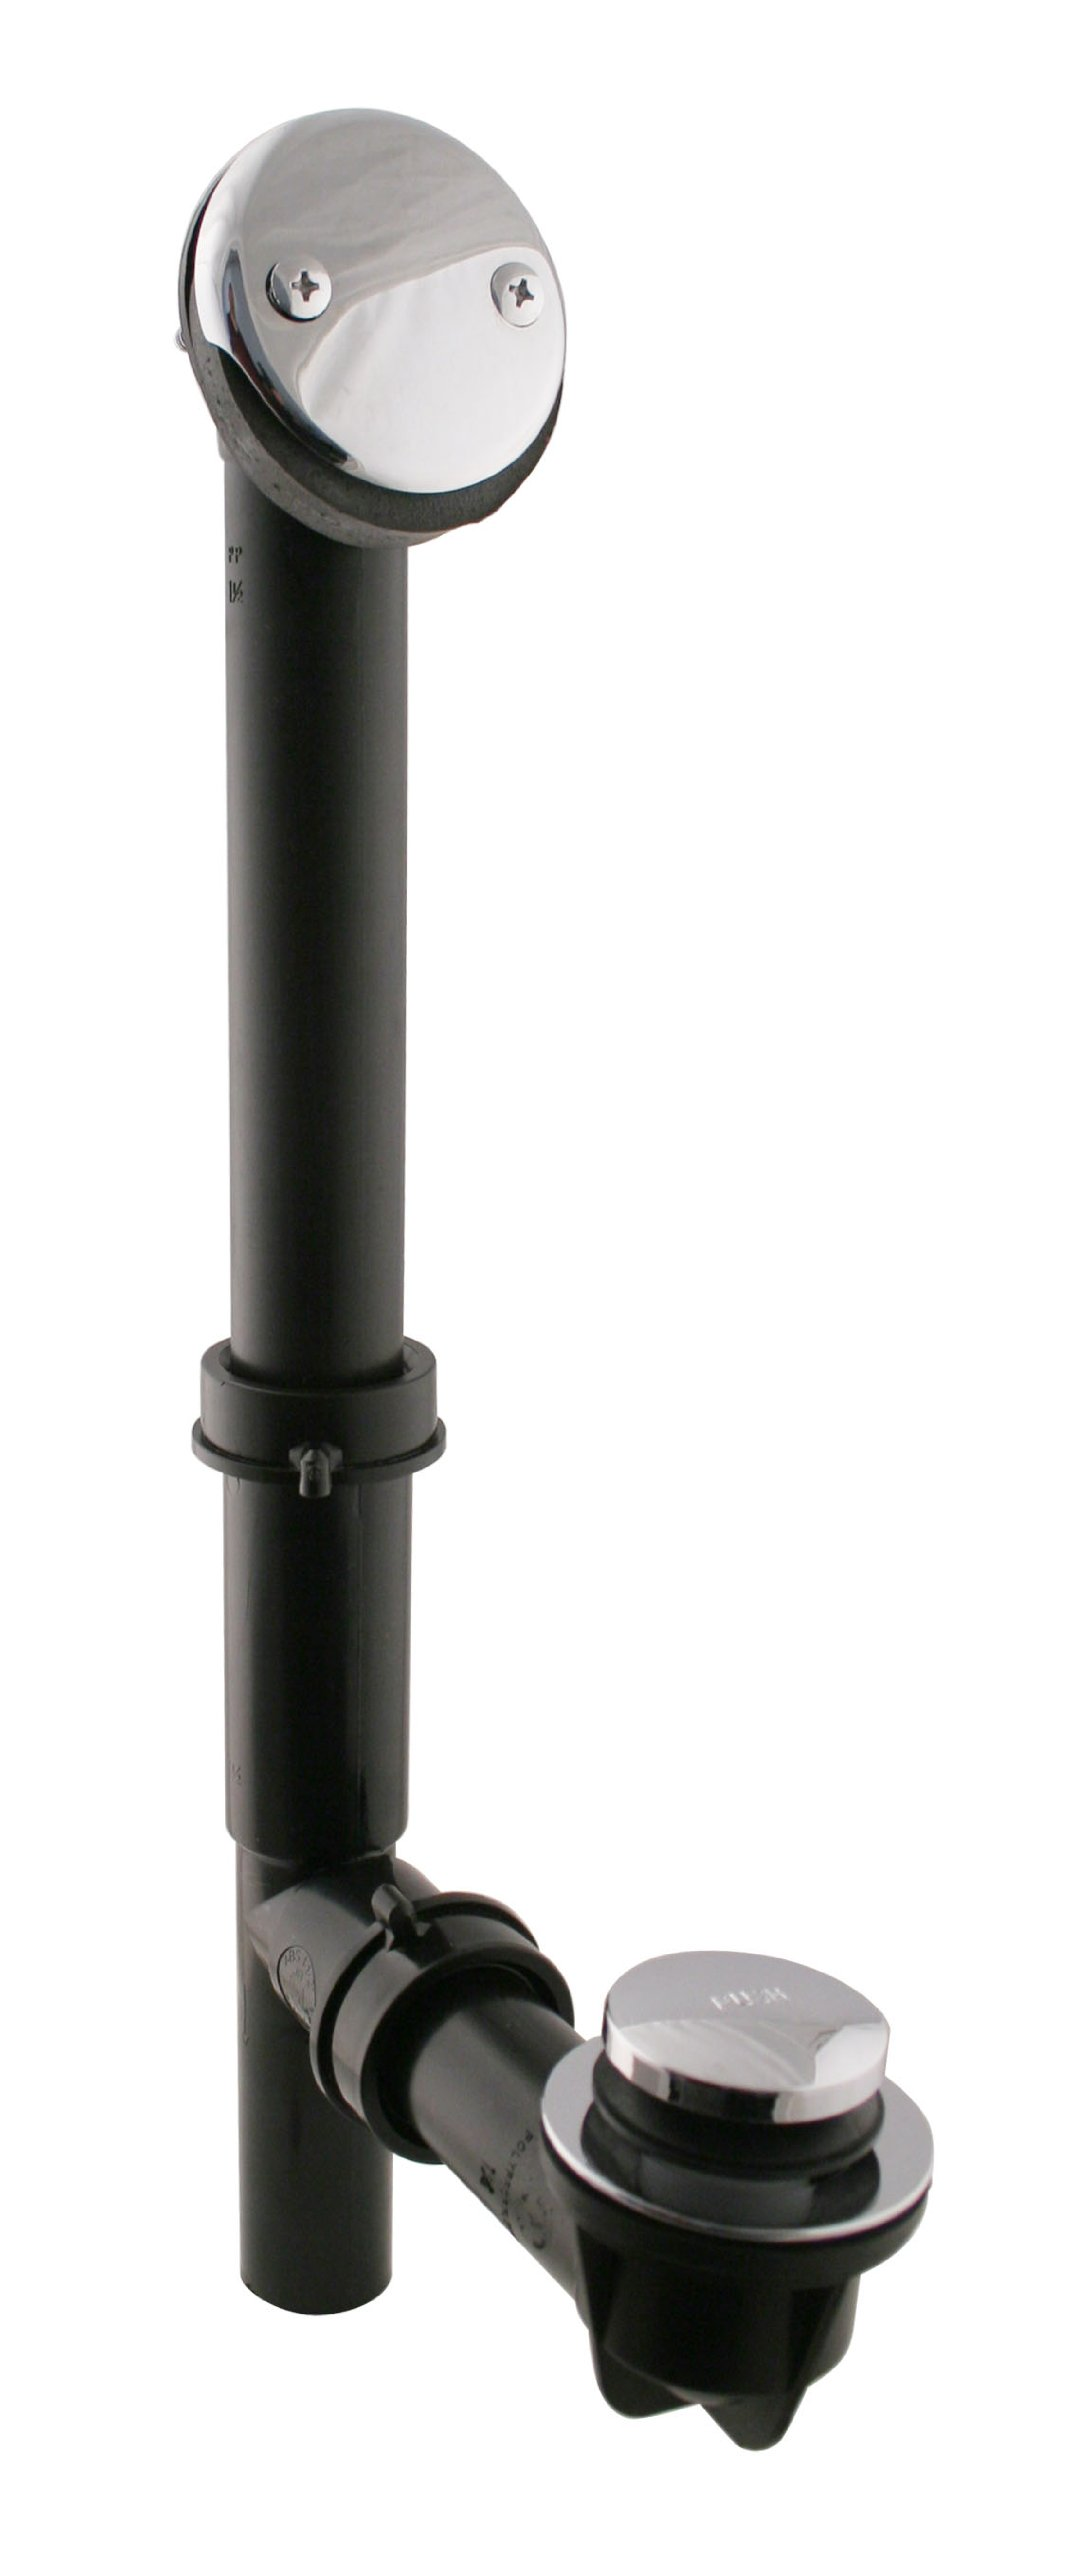 Westbrass Y593144CP Black Tubular Tip-Toe Drain Bath Waste and Overflow, Polished Chrome